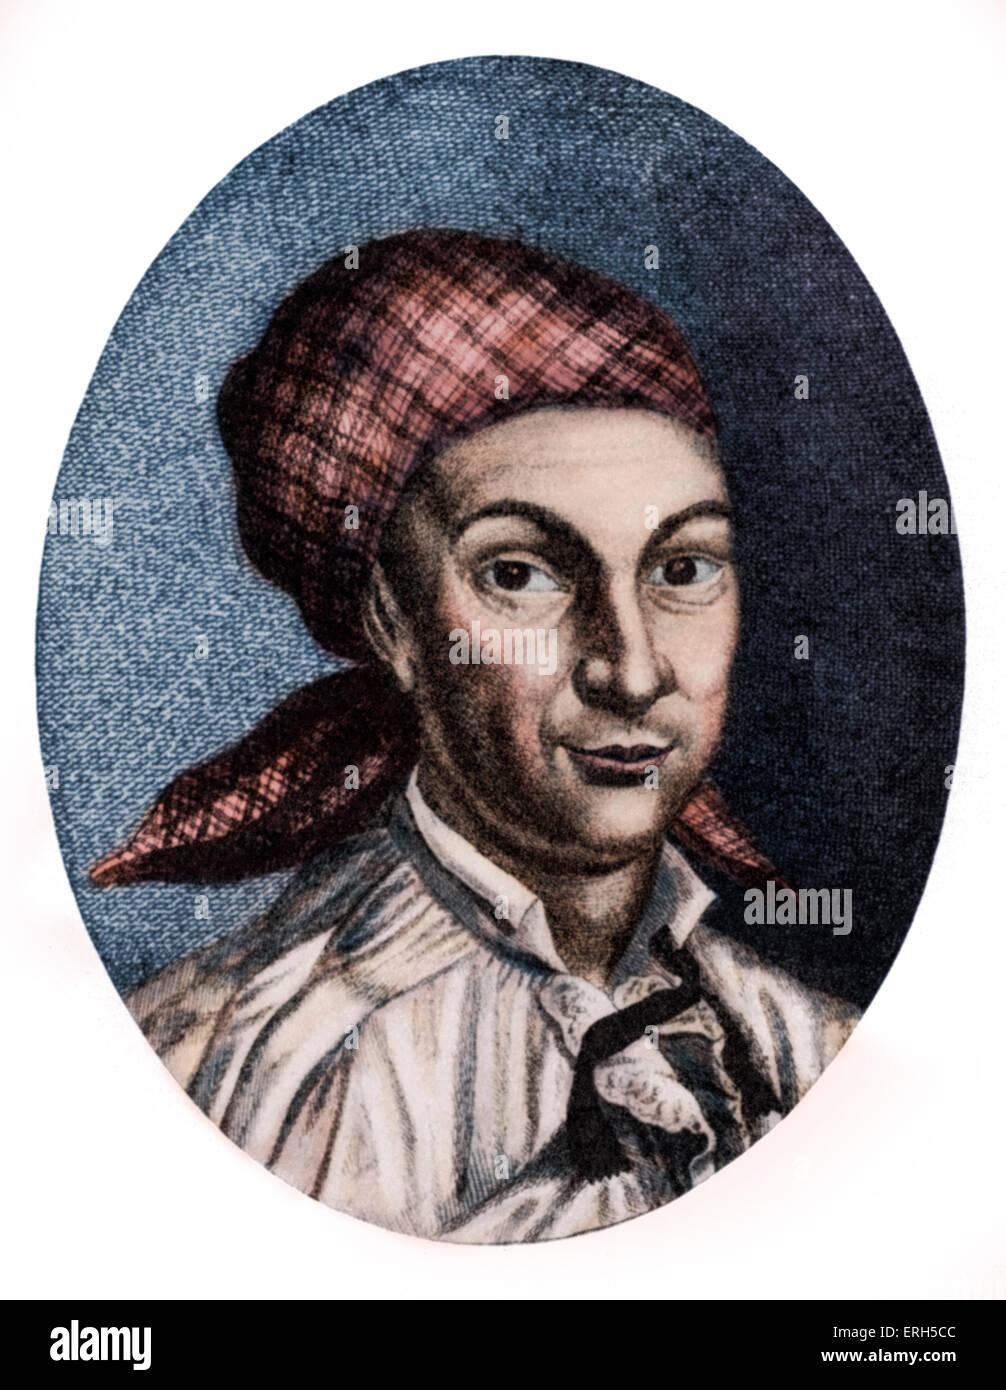 Johann Georg Hamann - portrait of the German philosopher, 27 August 1730 - 21 June 1788. Colourised version. - Stock Image